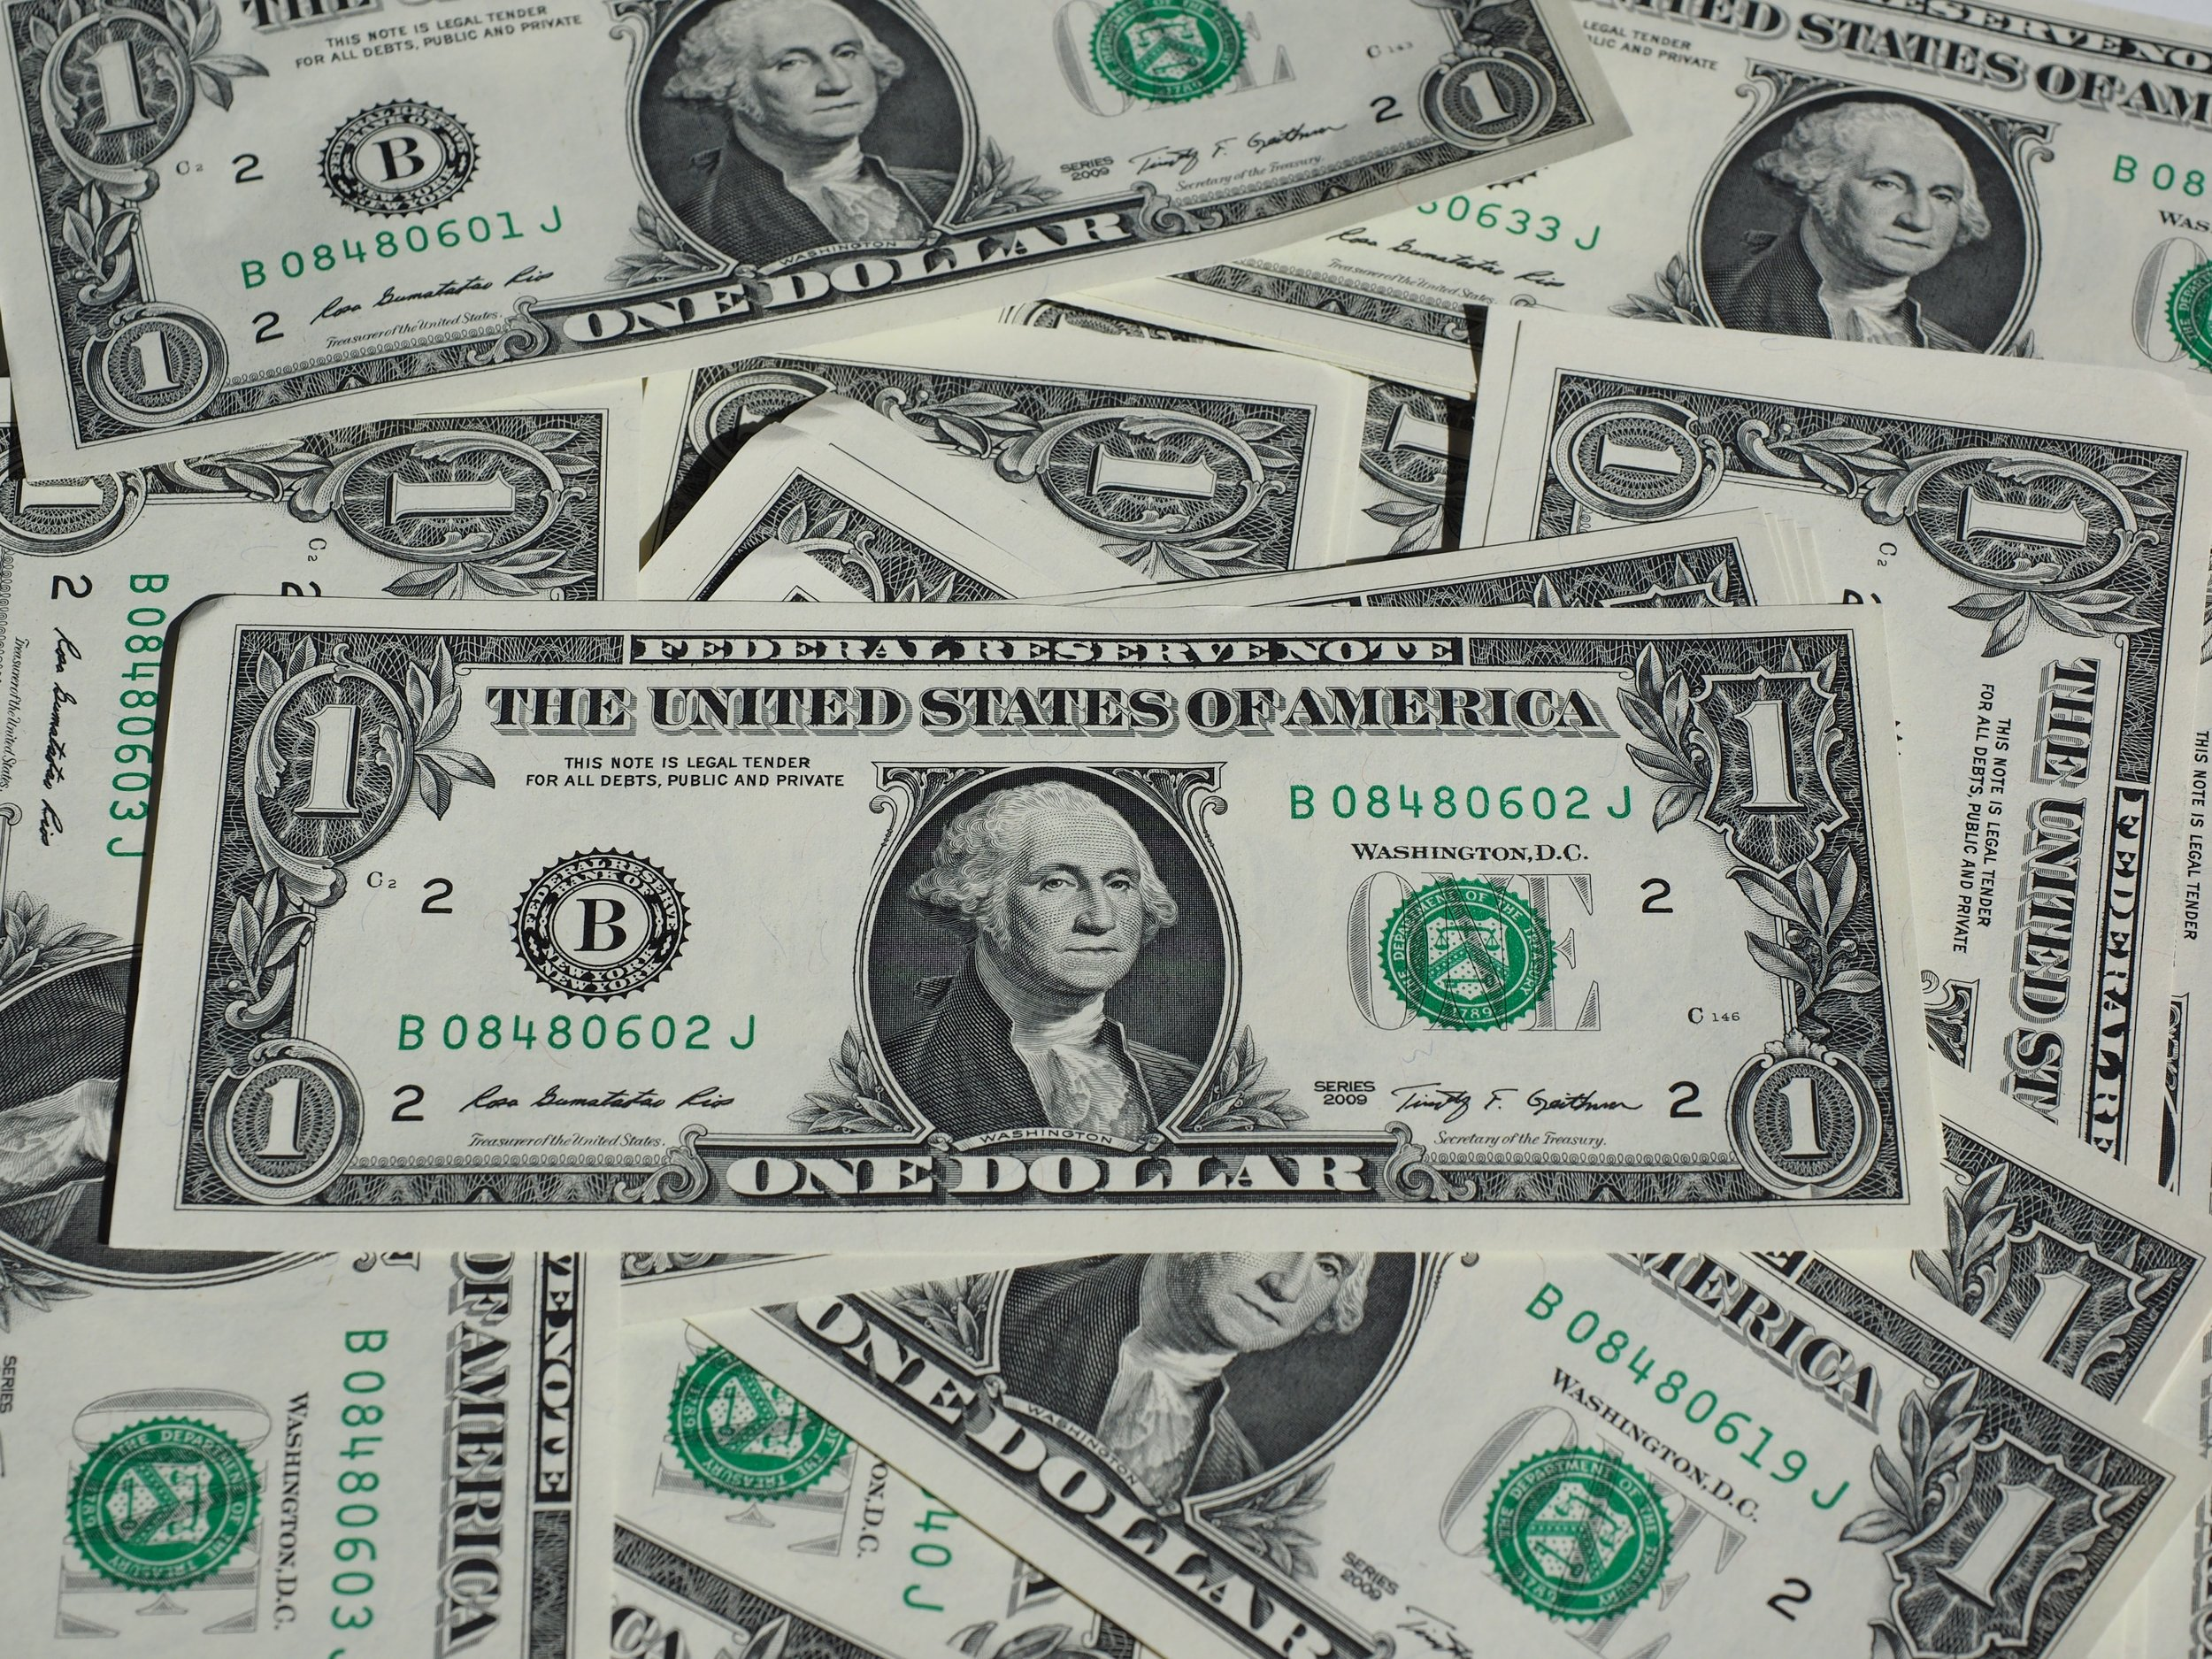 bank-notes-bills-cash-259191.jpg